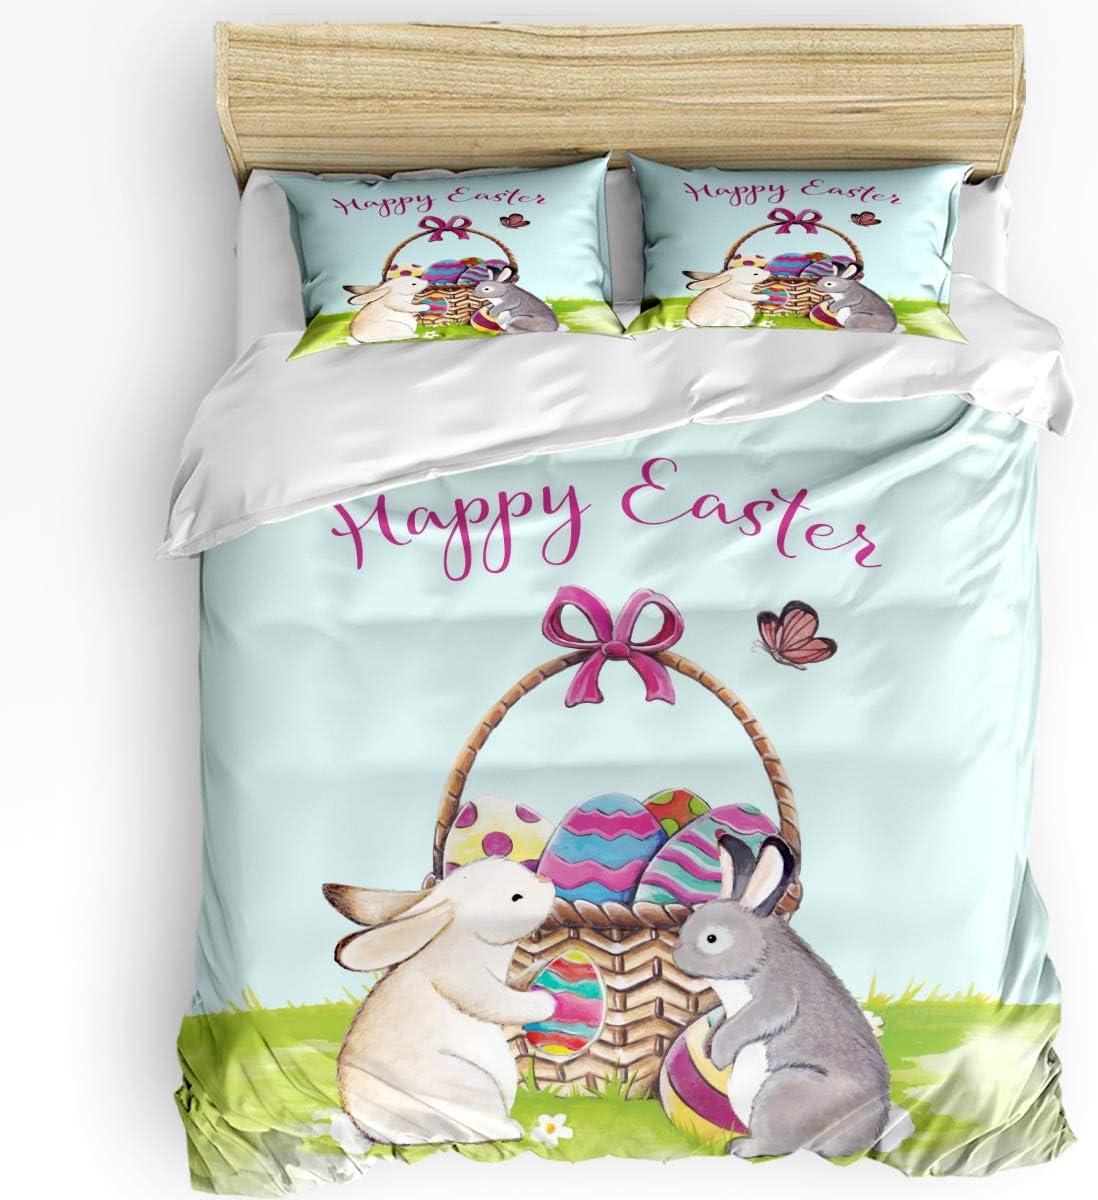 HELLOWINK Duvet Cover 3 Piece Bedding Regular discount Set Size Easte safety Happy King